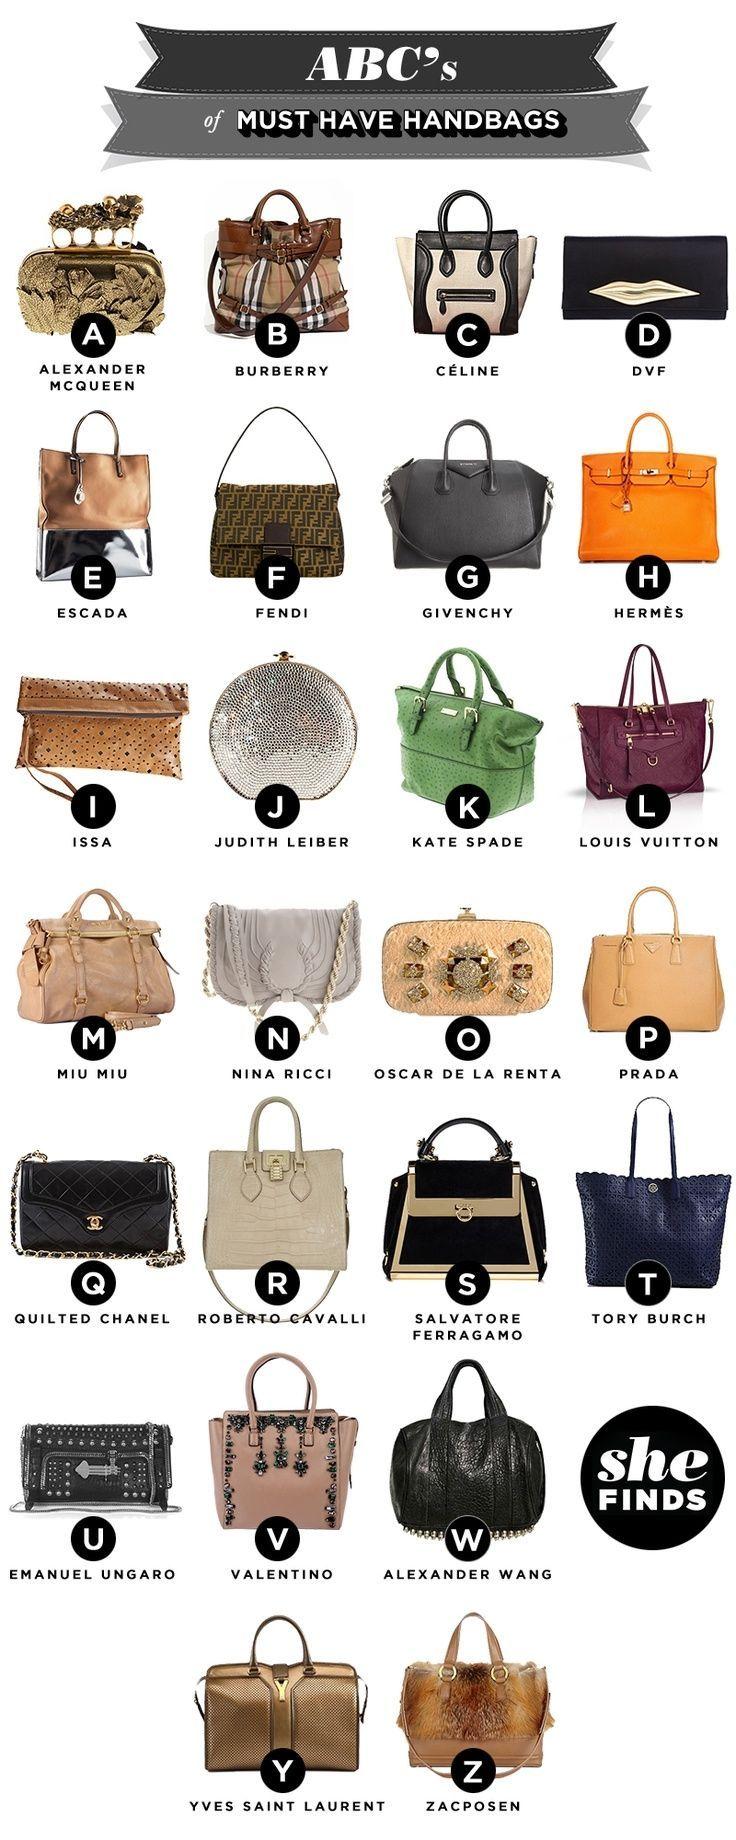 Louis Vuitton clipart designer handbag Handbags purses have Pinterest fashion